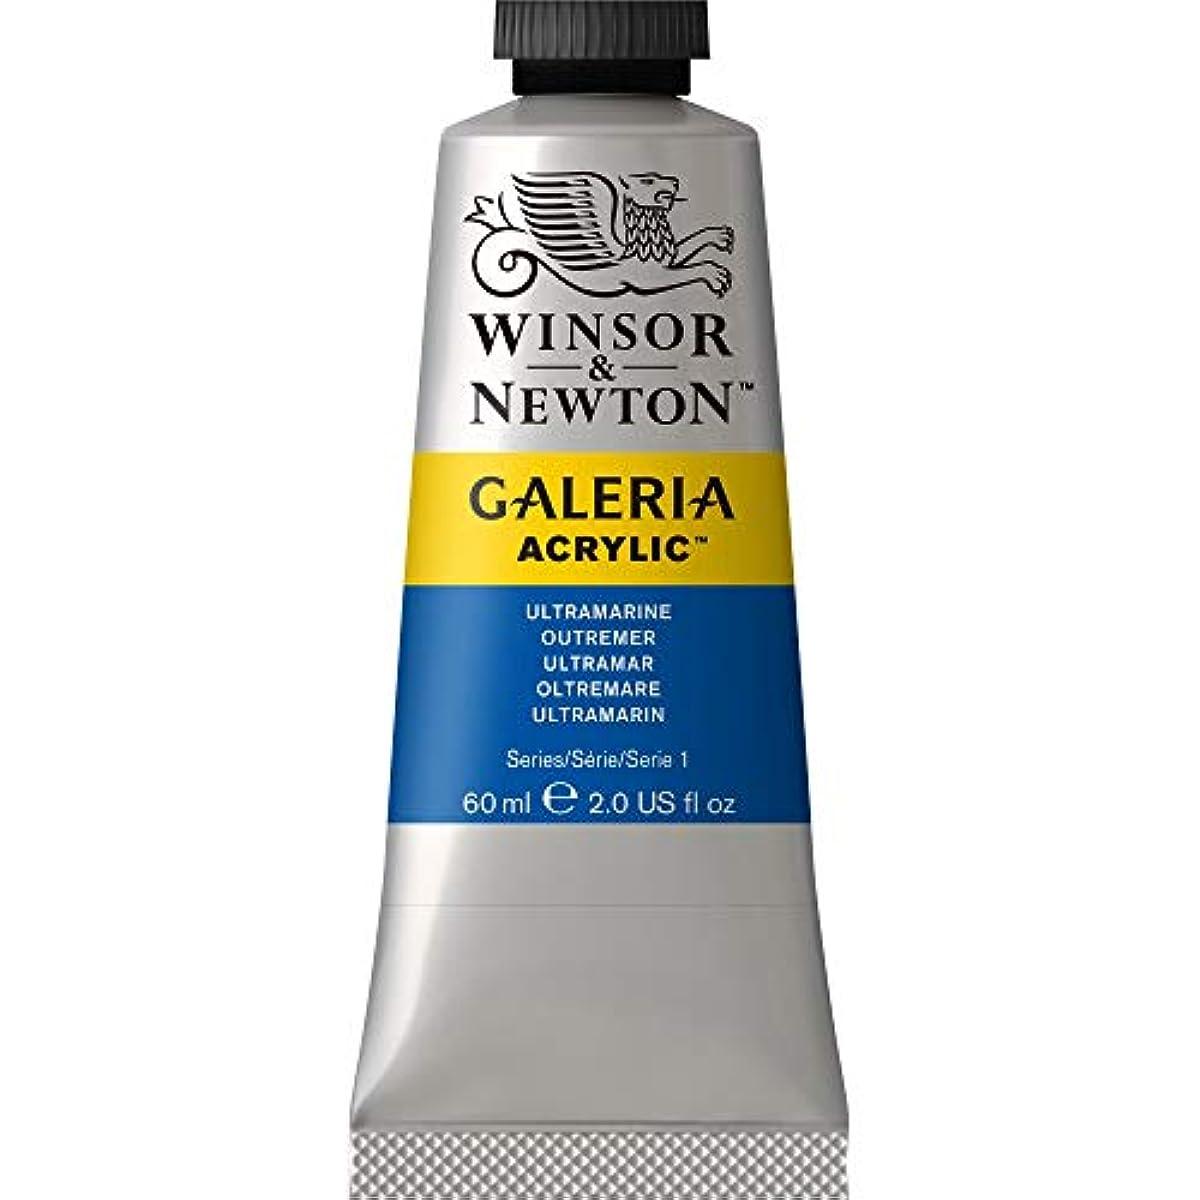 Winsor & Newton Galeria Acrylic Paint, 60ml Tube, Ultramarine